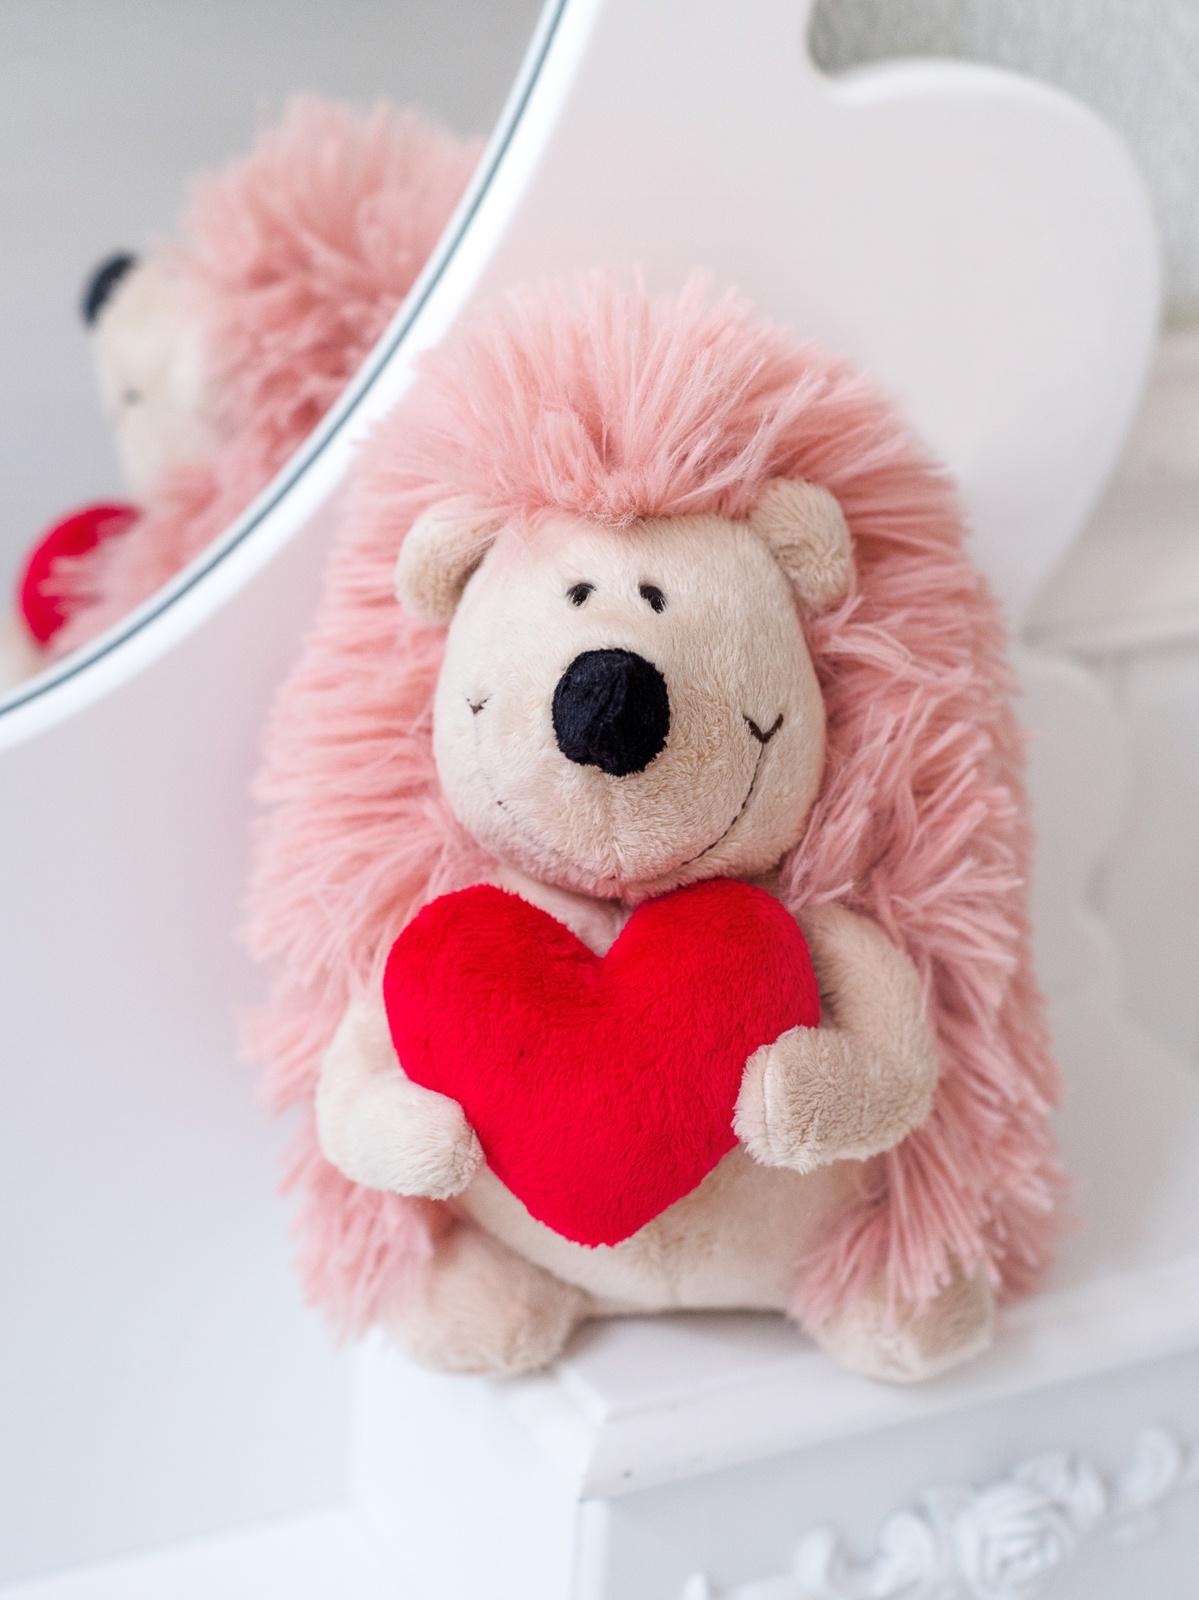 Мягкая игрушка Плюш Ленд Ёжик с сердечком, MA5017/17A светло-розовый